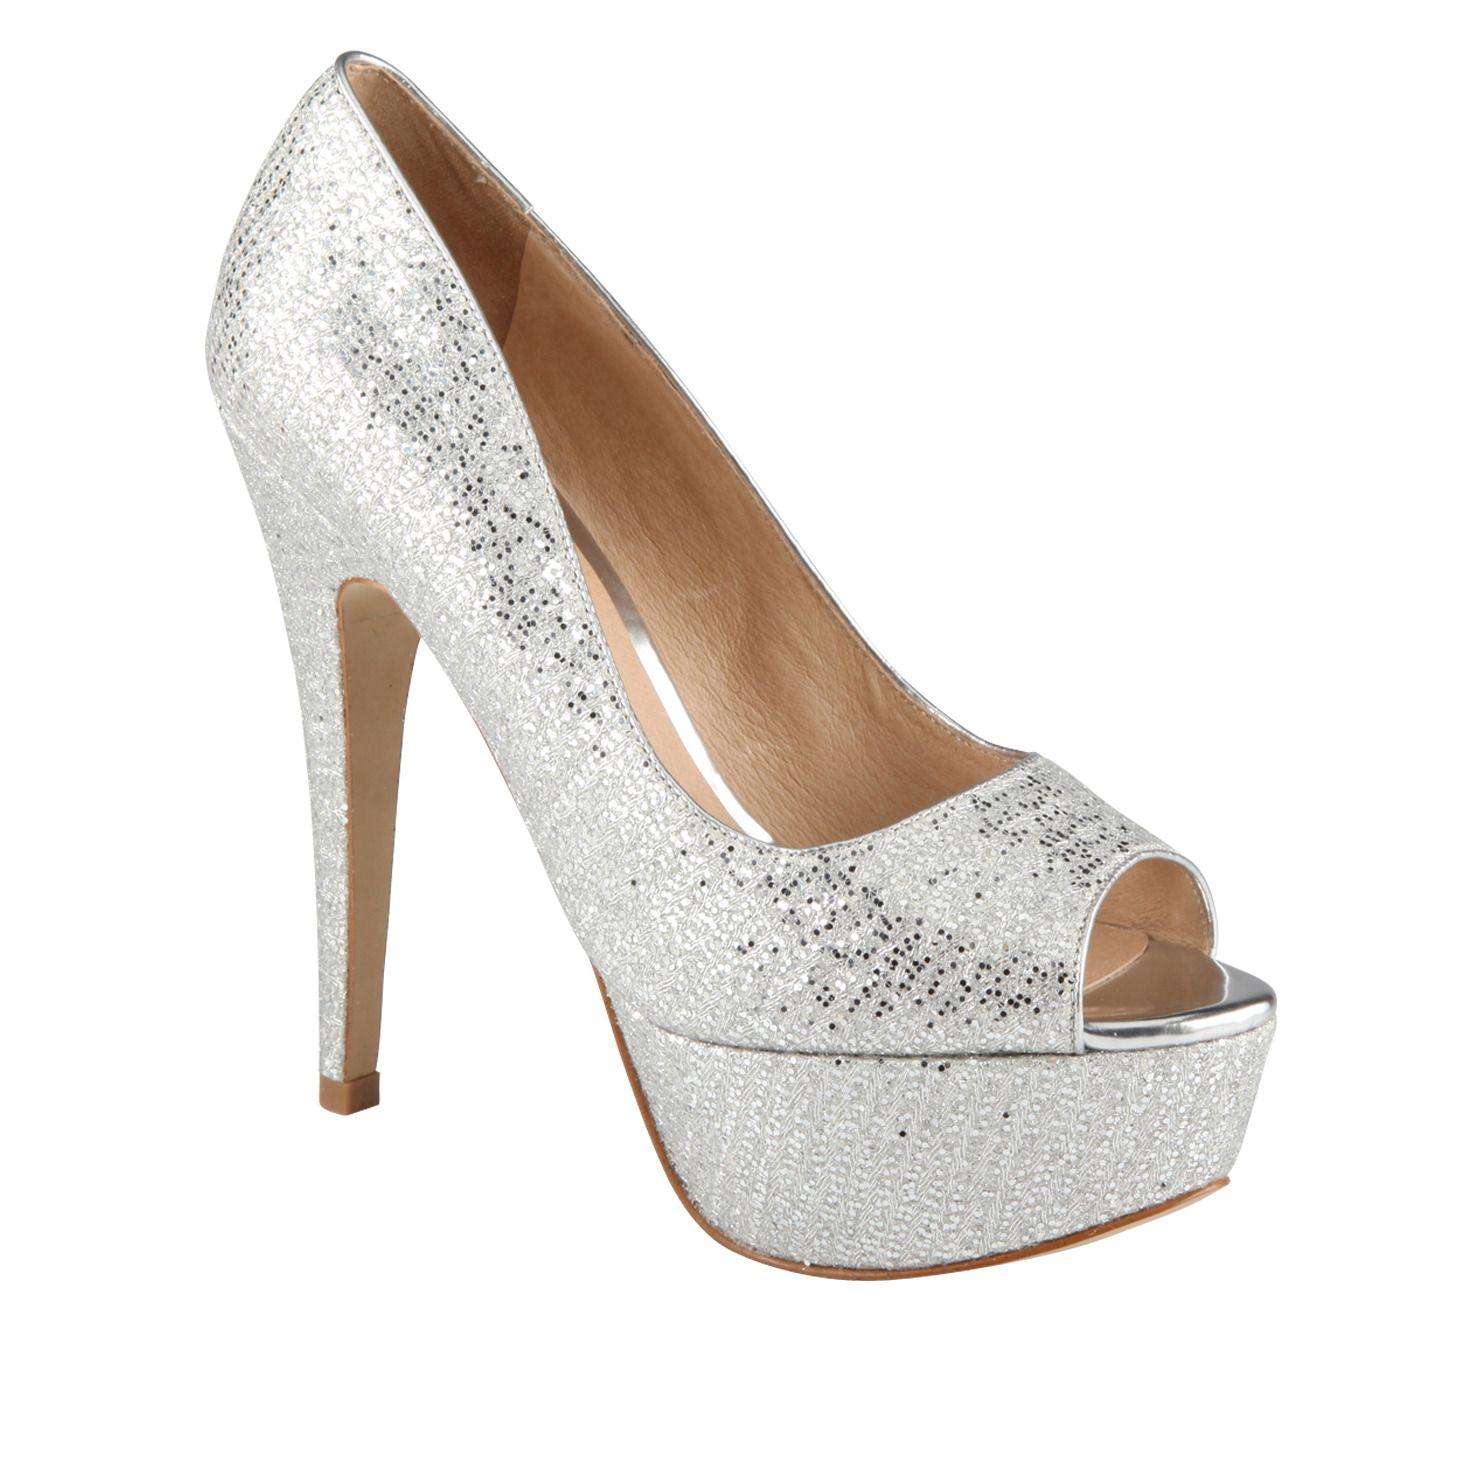 799dc67b327 ALDO women s peep-toe pumps  Berthina  ALDO aldoshoes.com